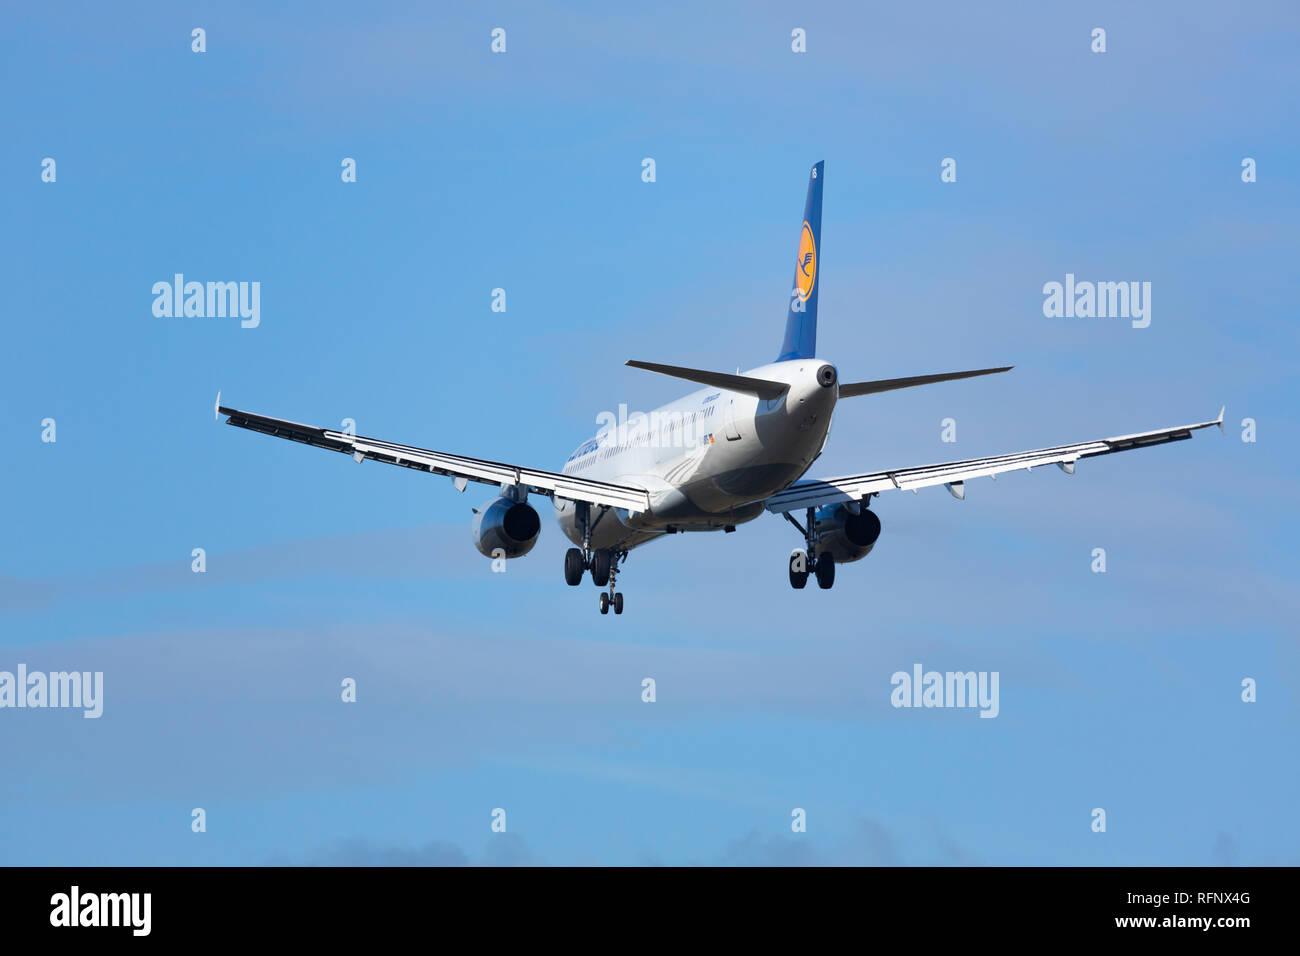 GERMANY, FRANKFURT - SEPTEMBER 06, 2015: Airbus A321-131, DD-AIRS of Lufthansa dropping at Frankfurt Airport - Stock Image